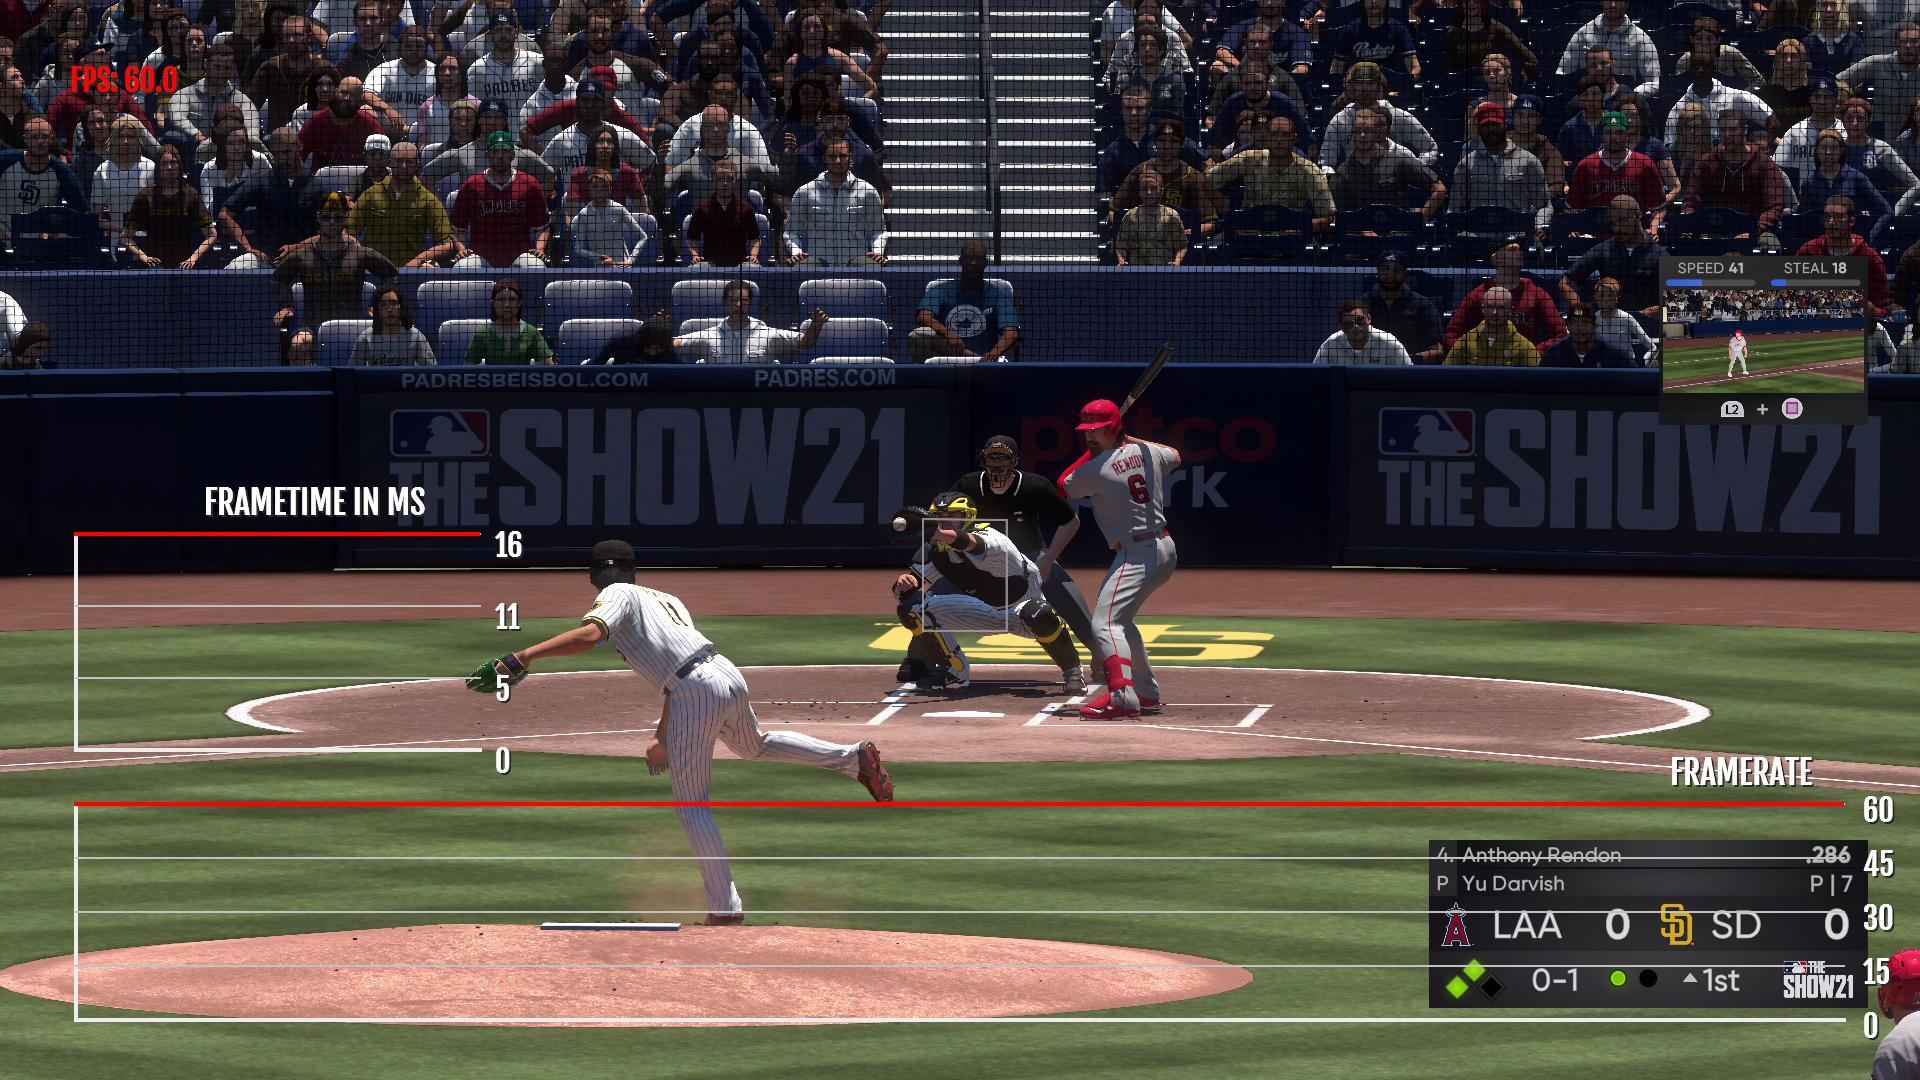 PS5 MLB 21 Frame count